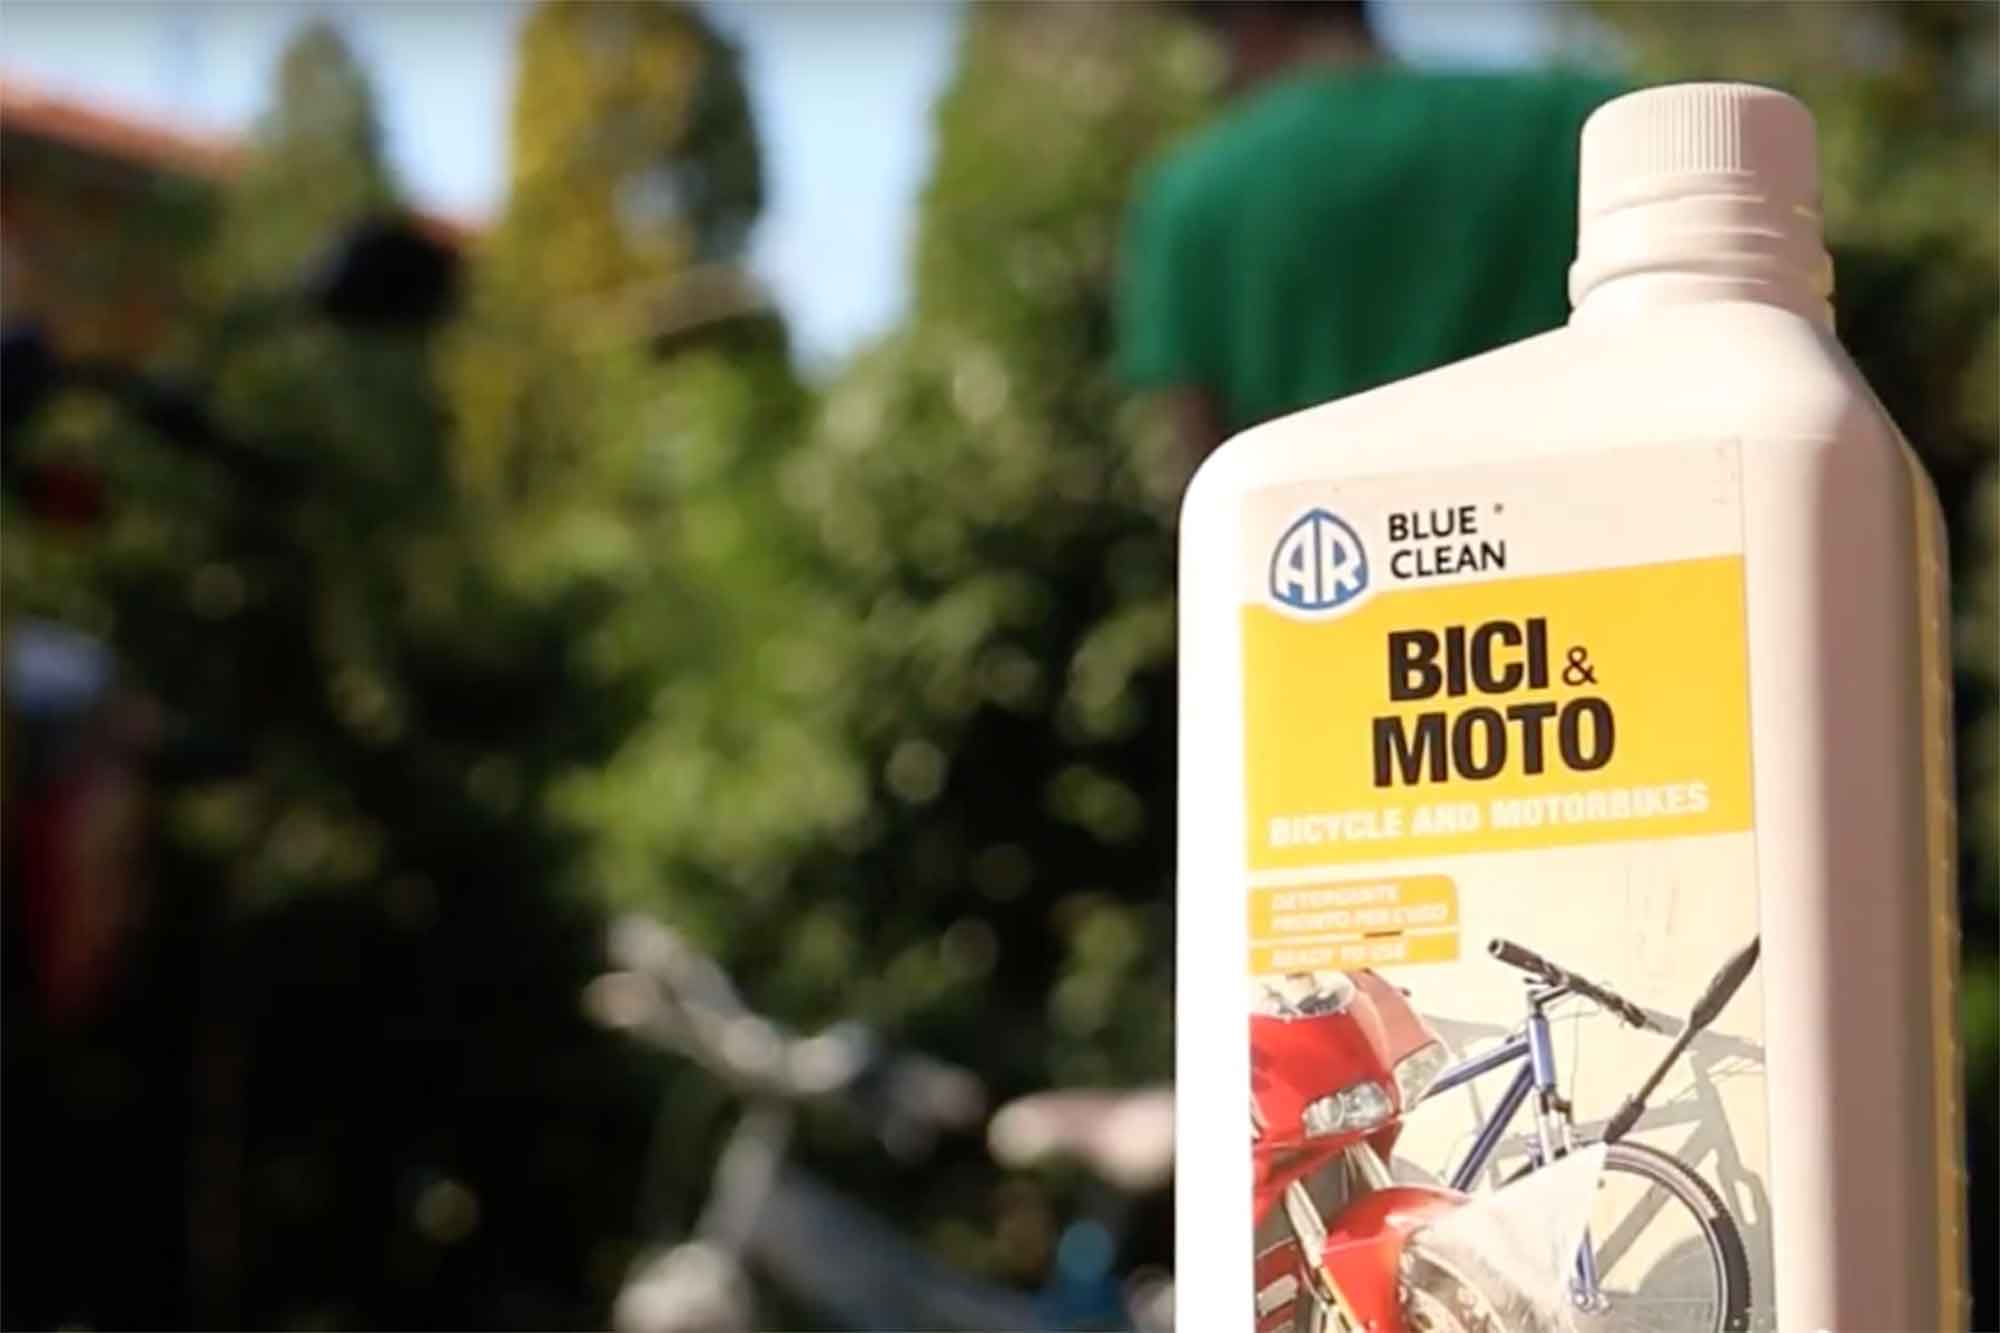 detergente pulizia bici